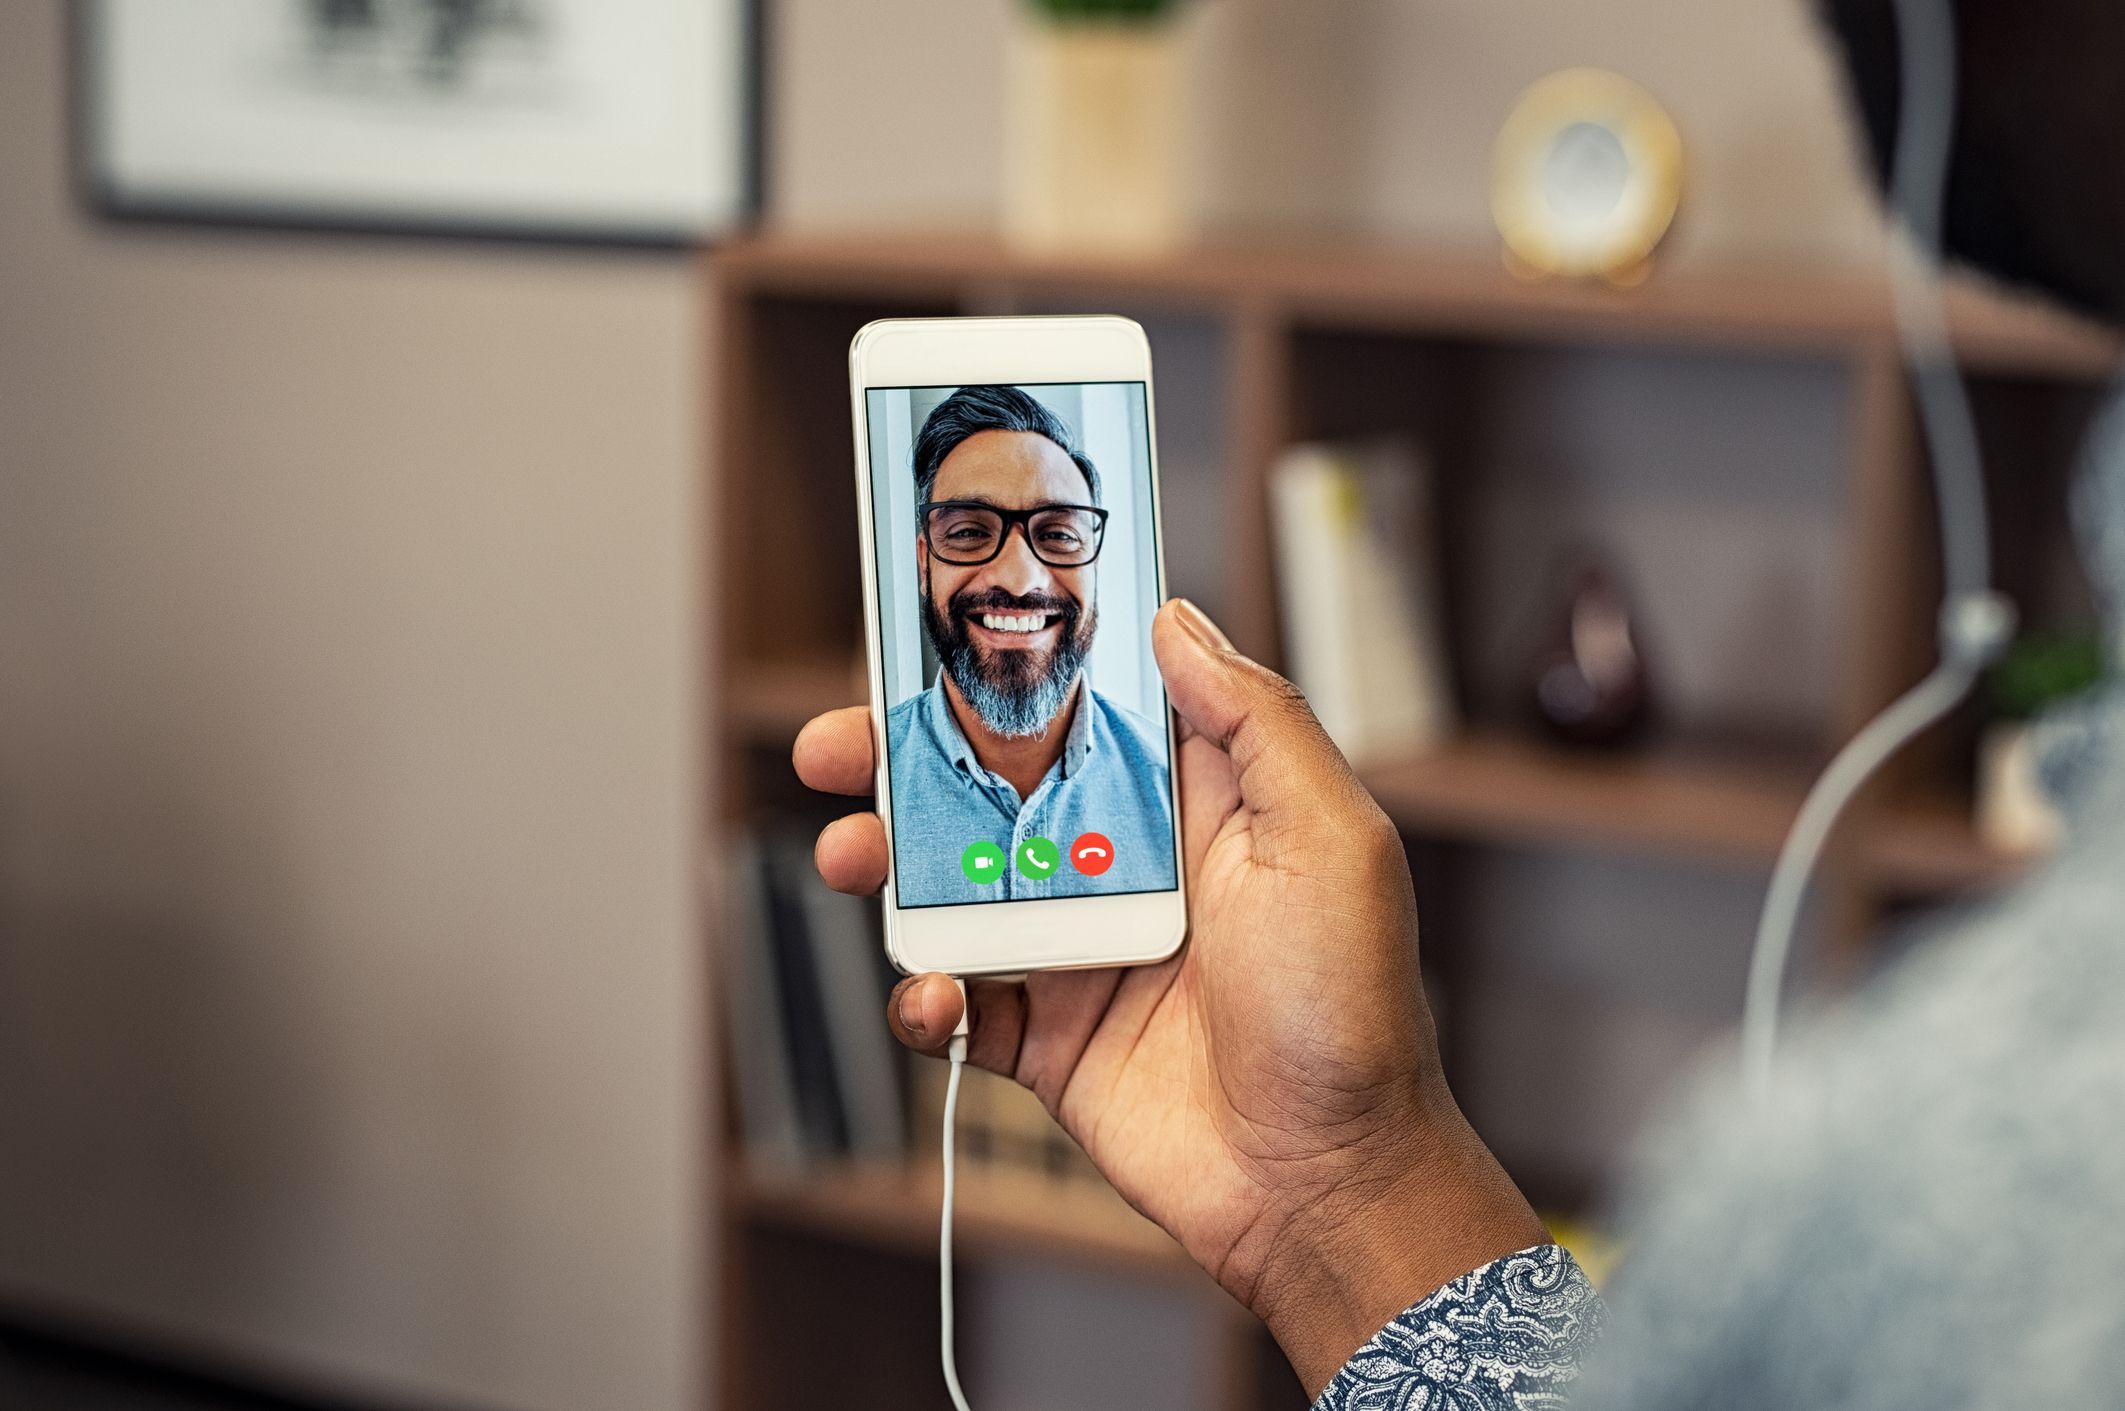 facetime dati cellulare iphone 6s